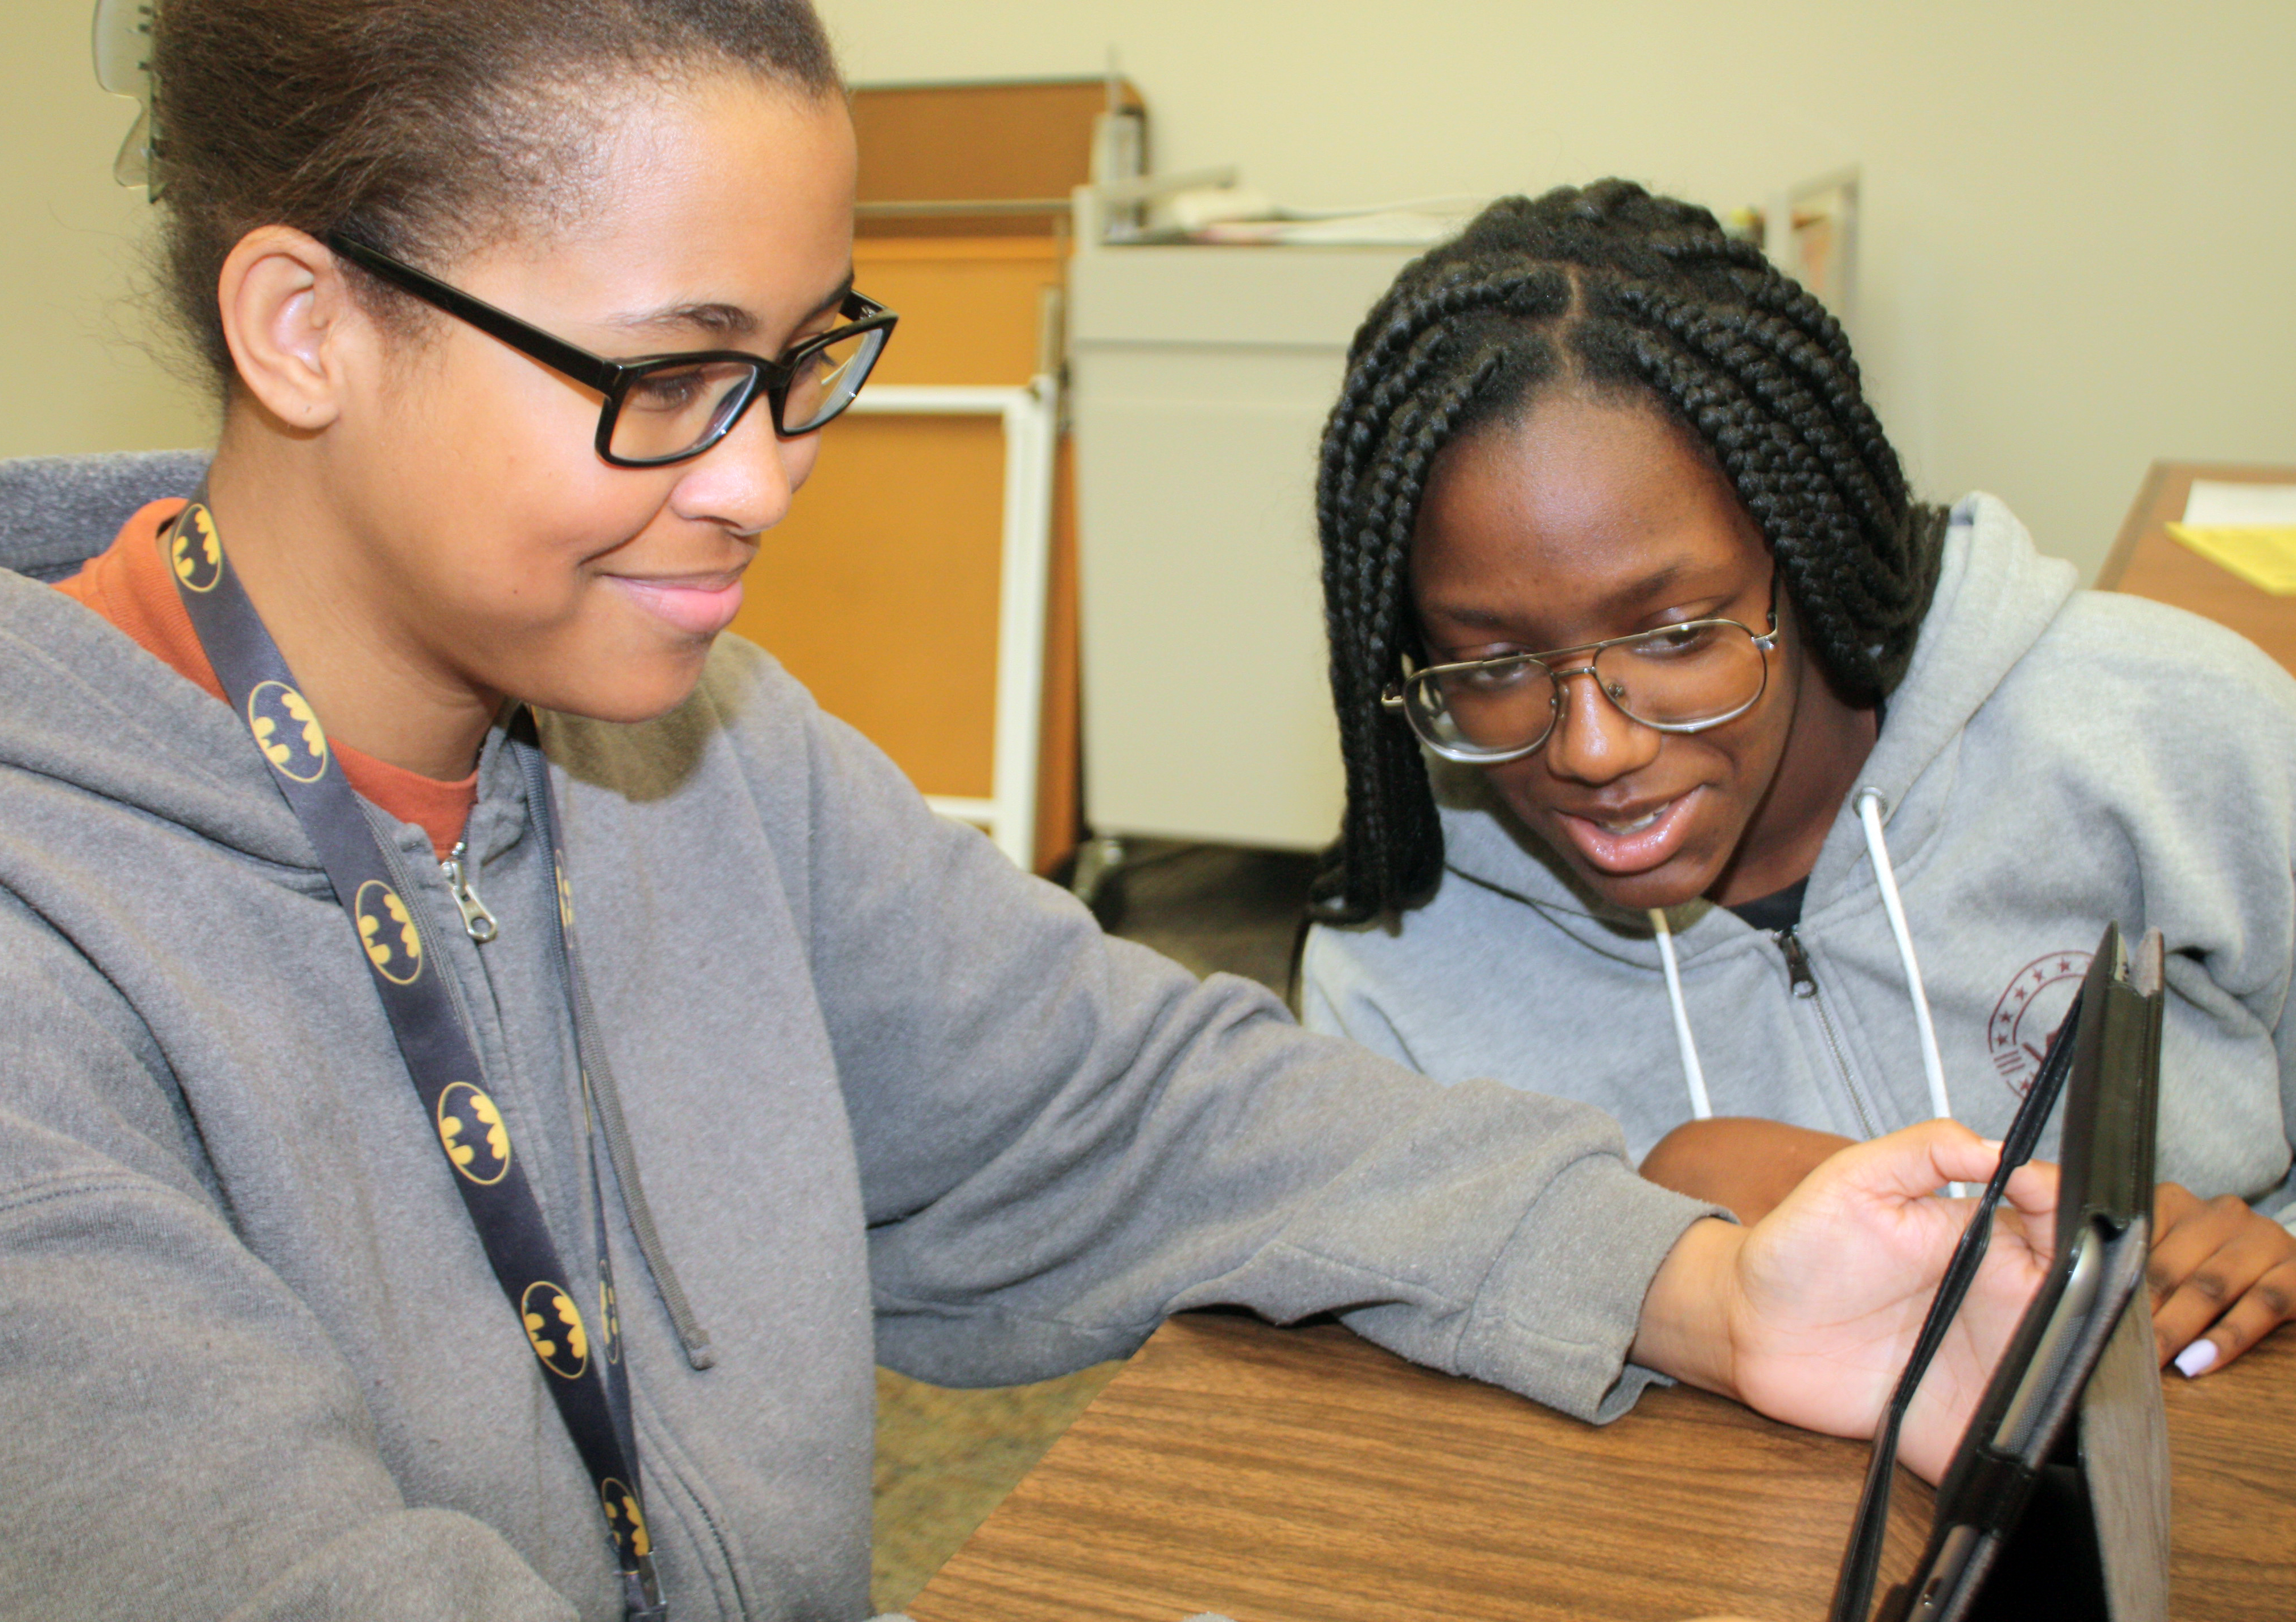 Adults learn tech skills